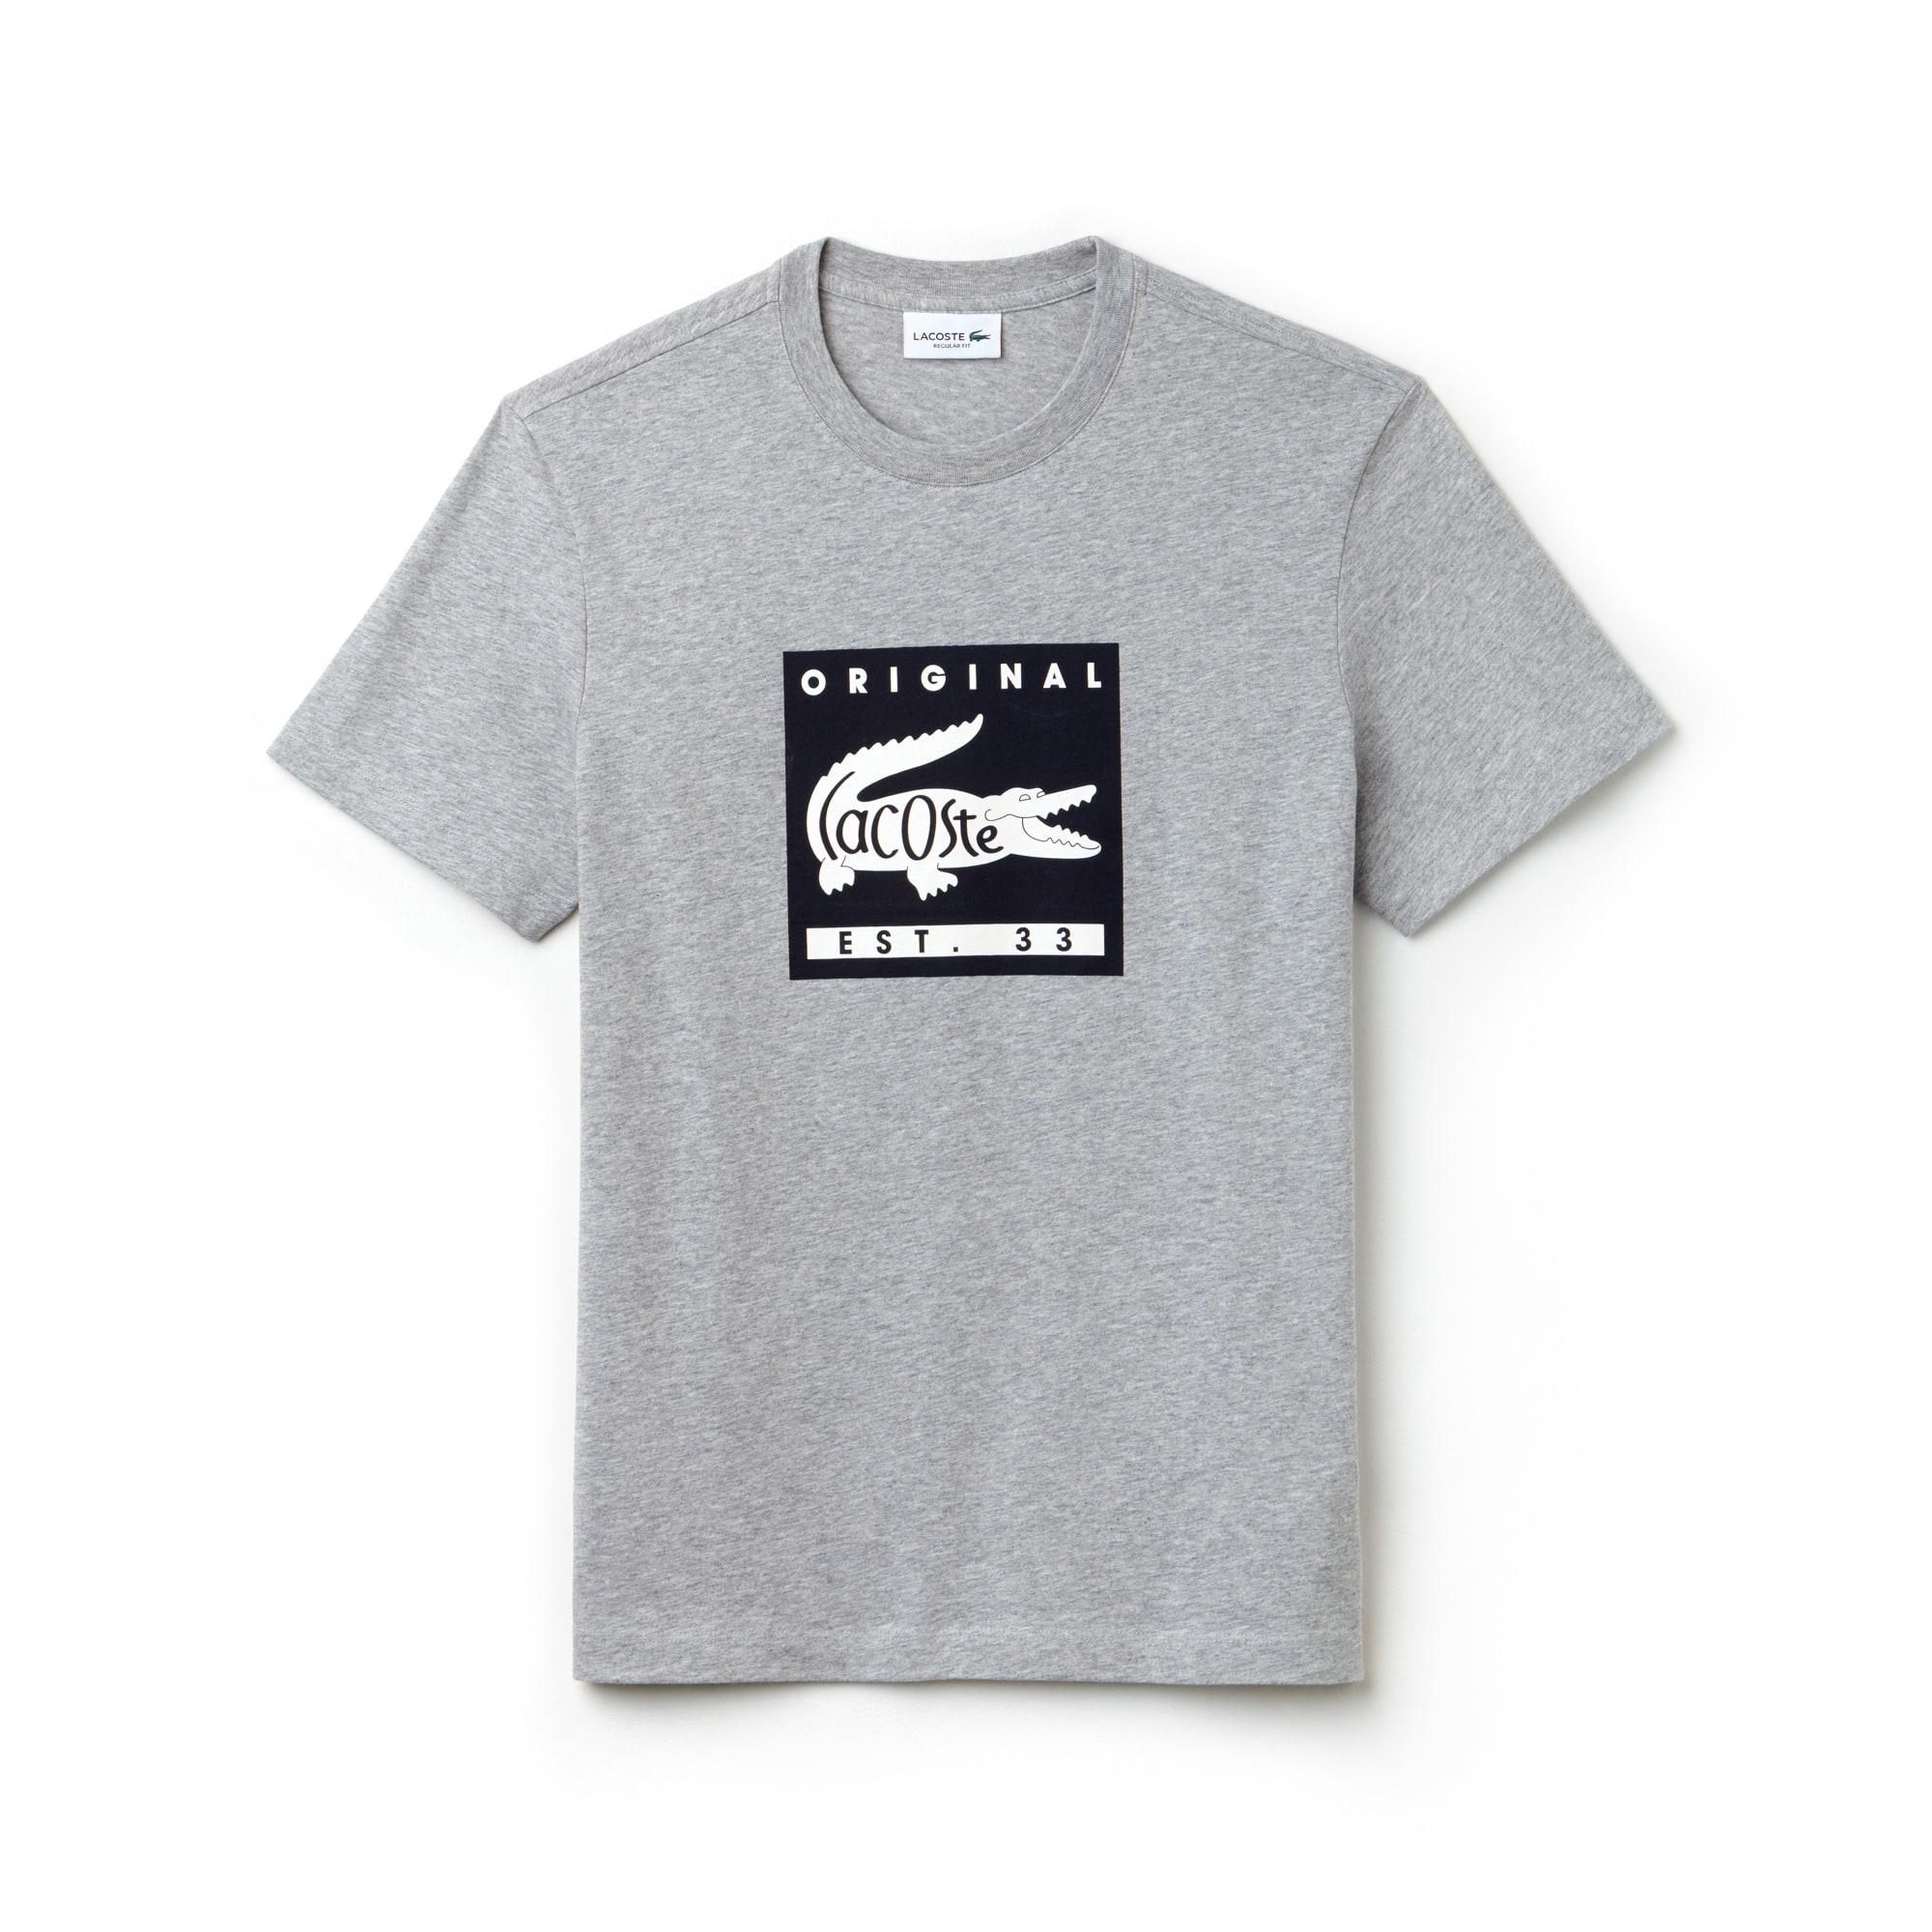 Men's Crew Neck Original Lettering Jersey T-shirt